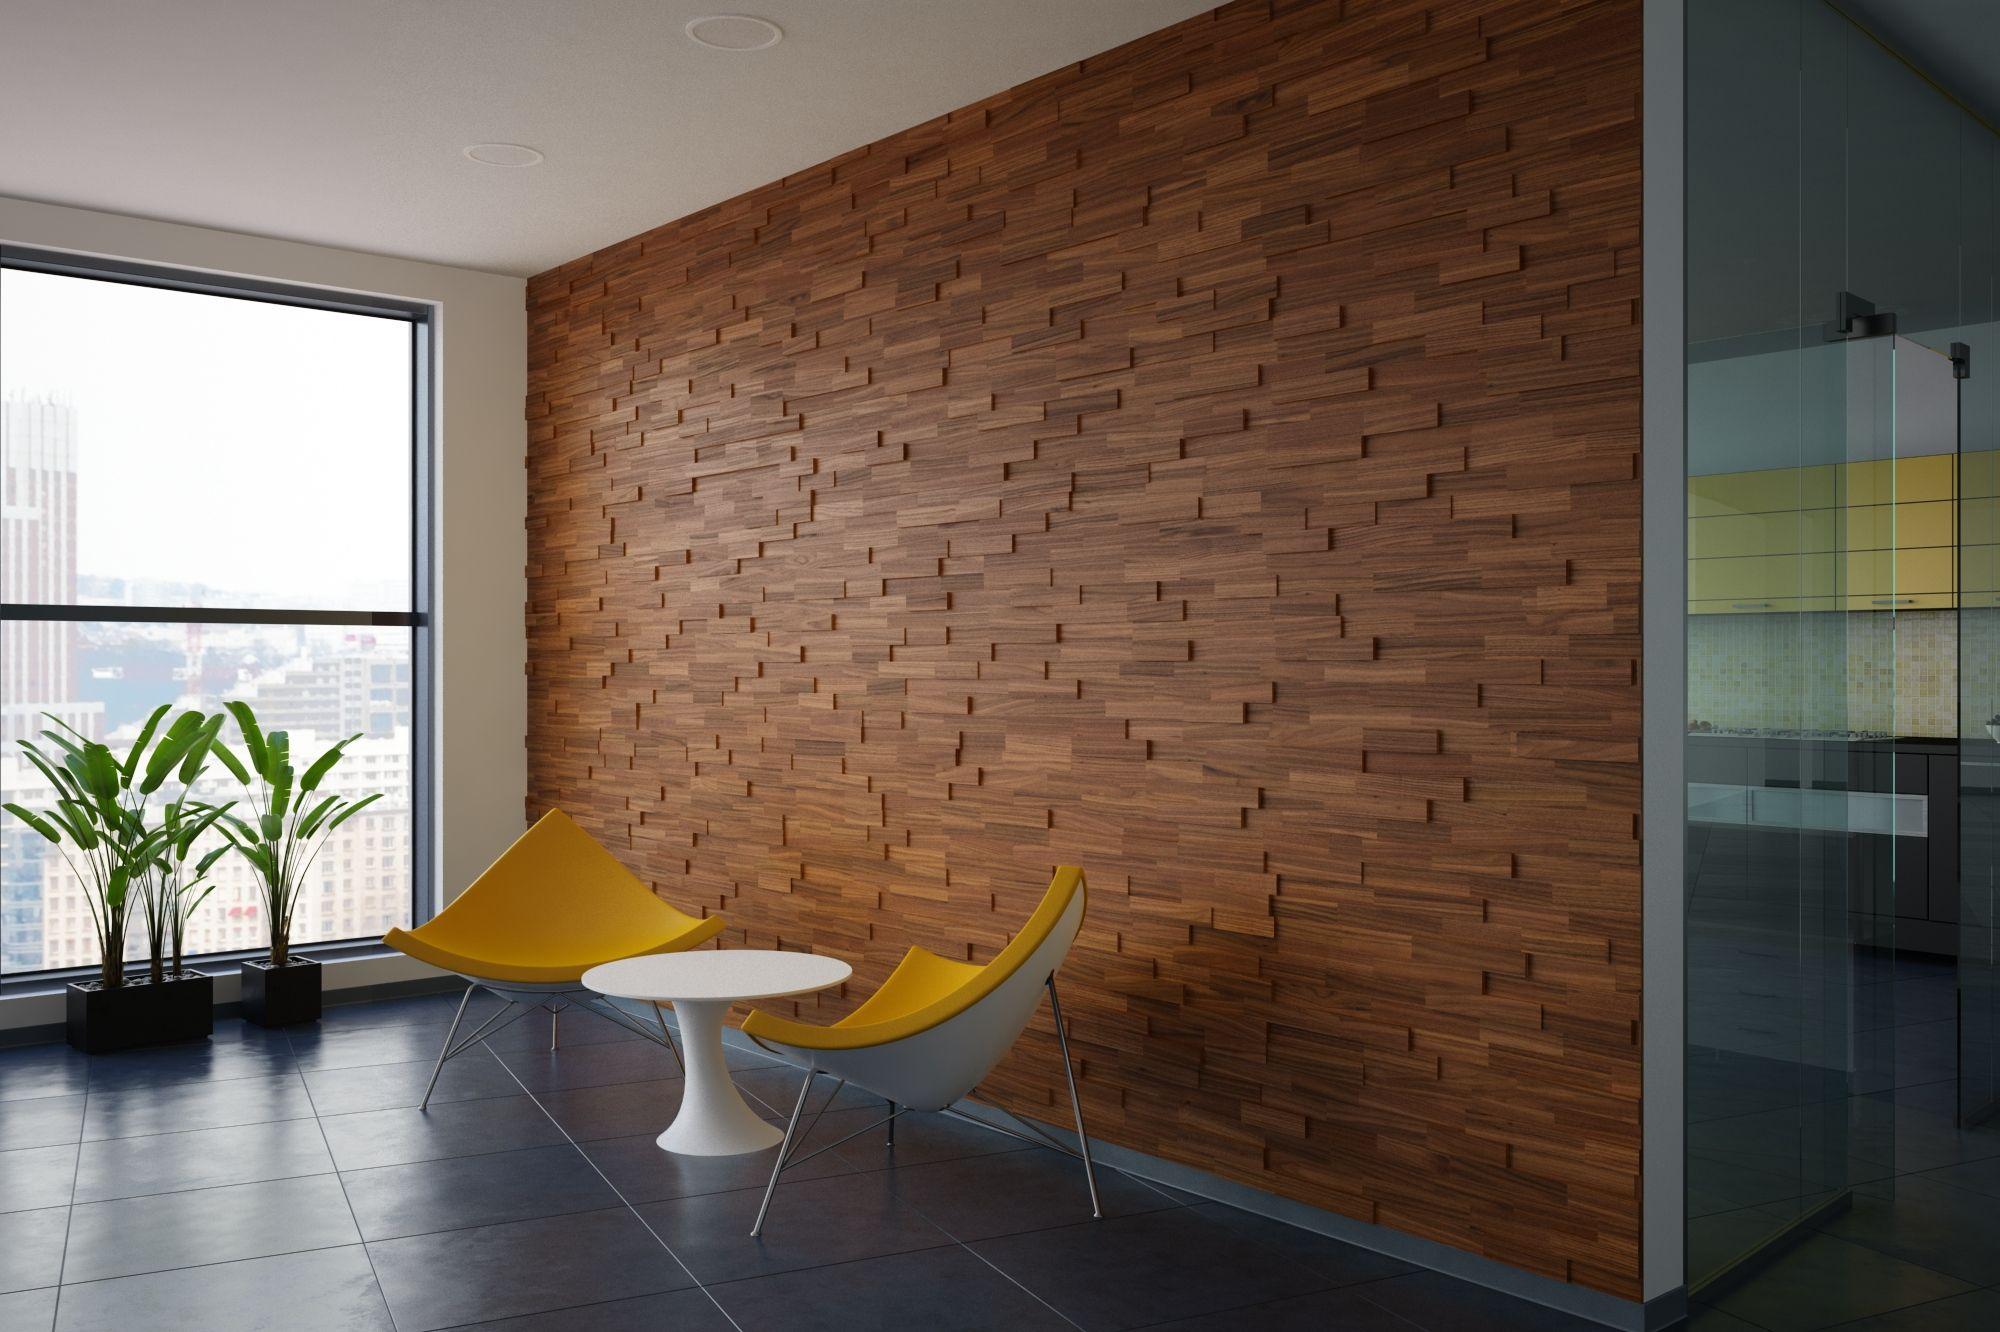 Mosaic Wood Paneling Gallery Interior Wall Panels By Walldecor